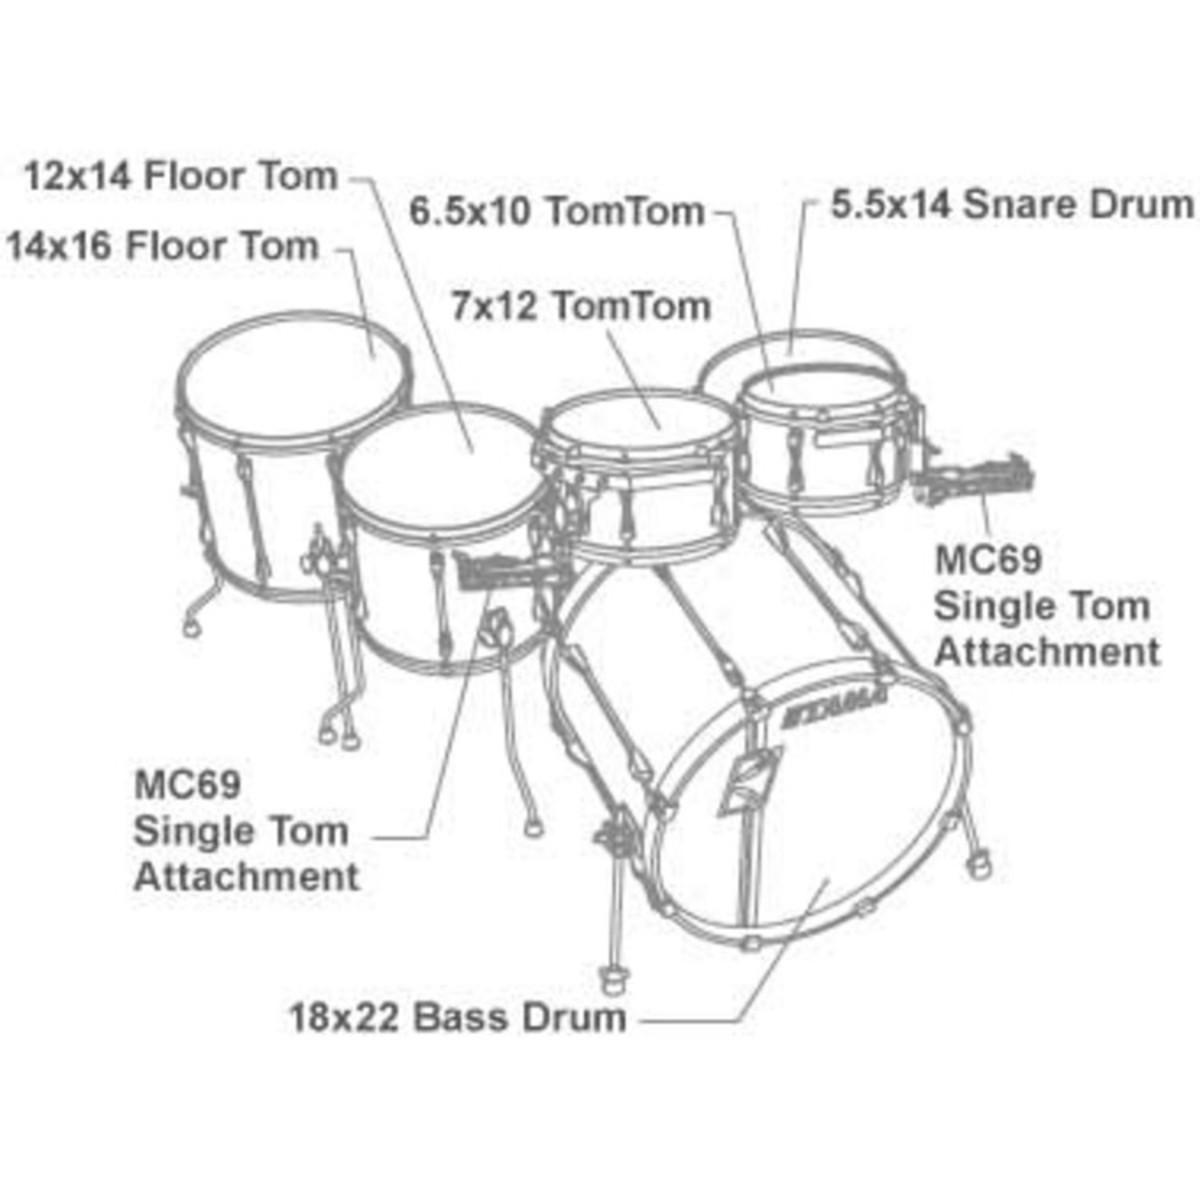 Disc Tama Superstar Hyperdrive Drum Kit Galaxy Silver Burst At Warwick Bass Wiring Diagram Loading Zoom